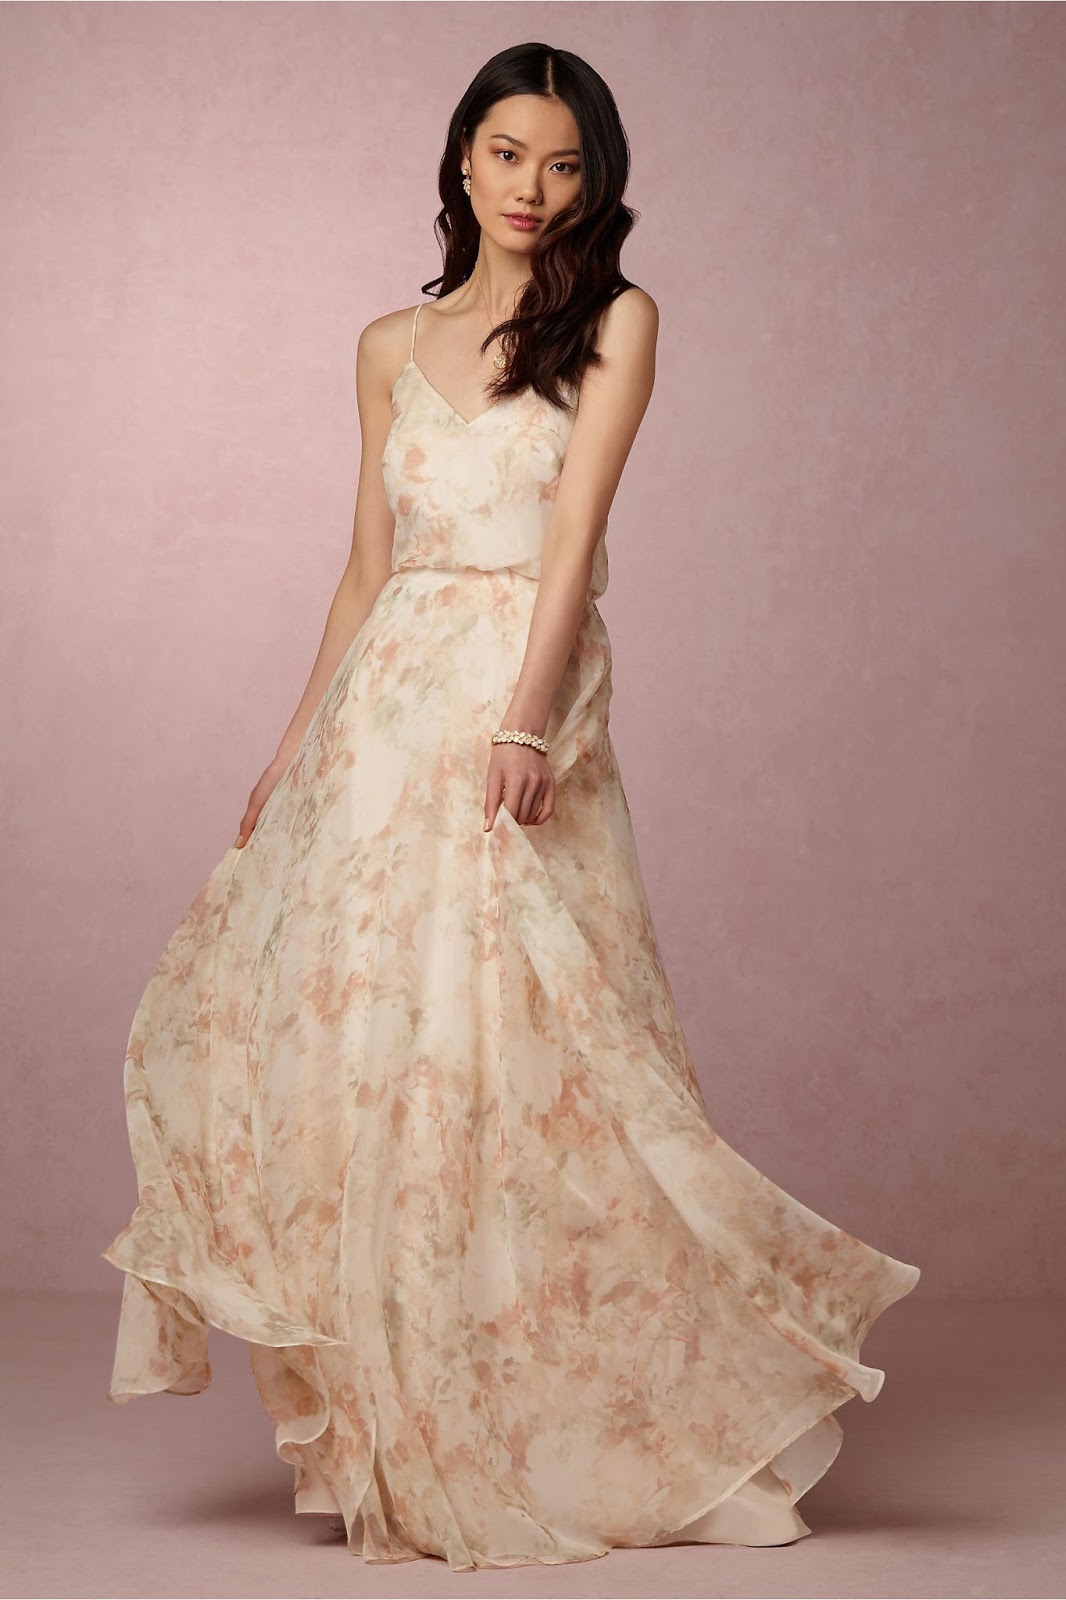 Vestidos de fiesta para boda ¡22 Ideas Sorprendentes!   Vestidos ...